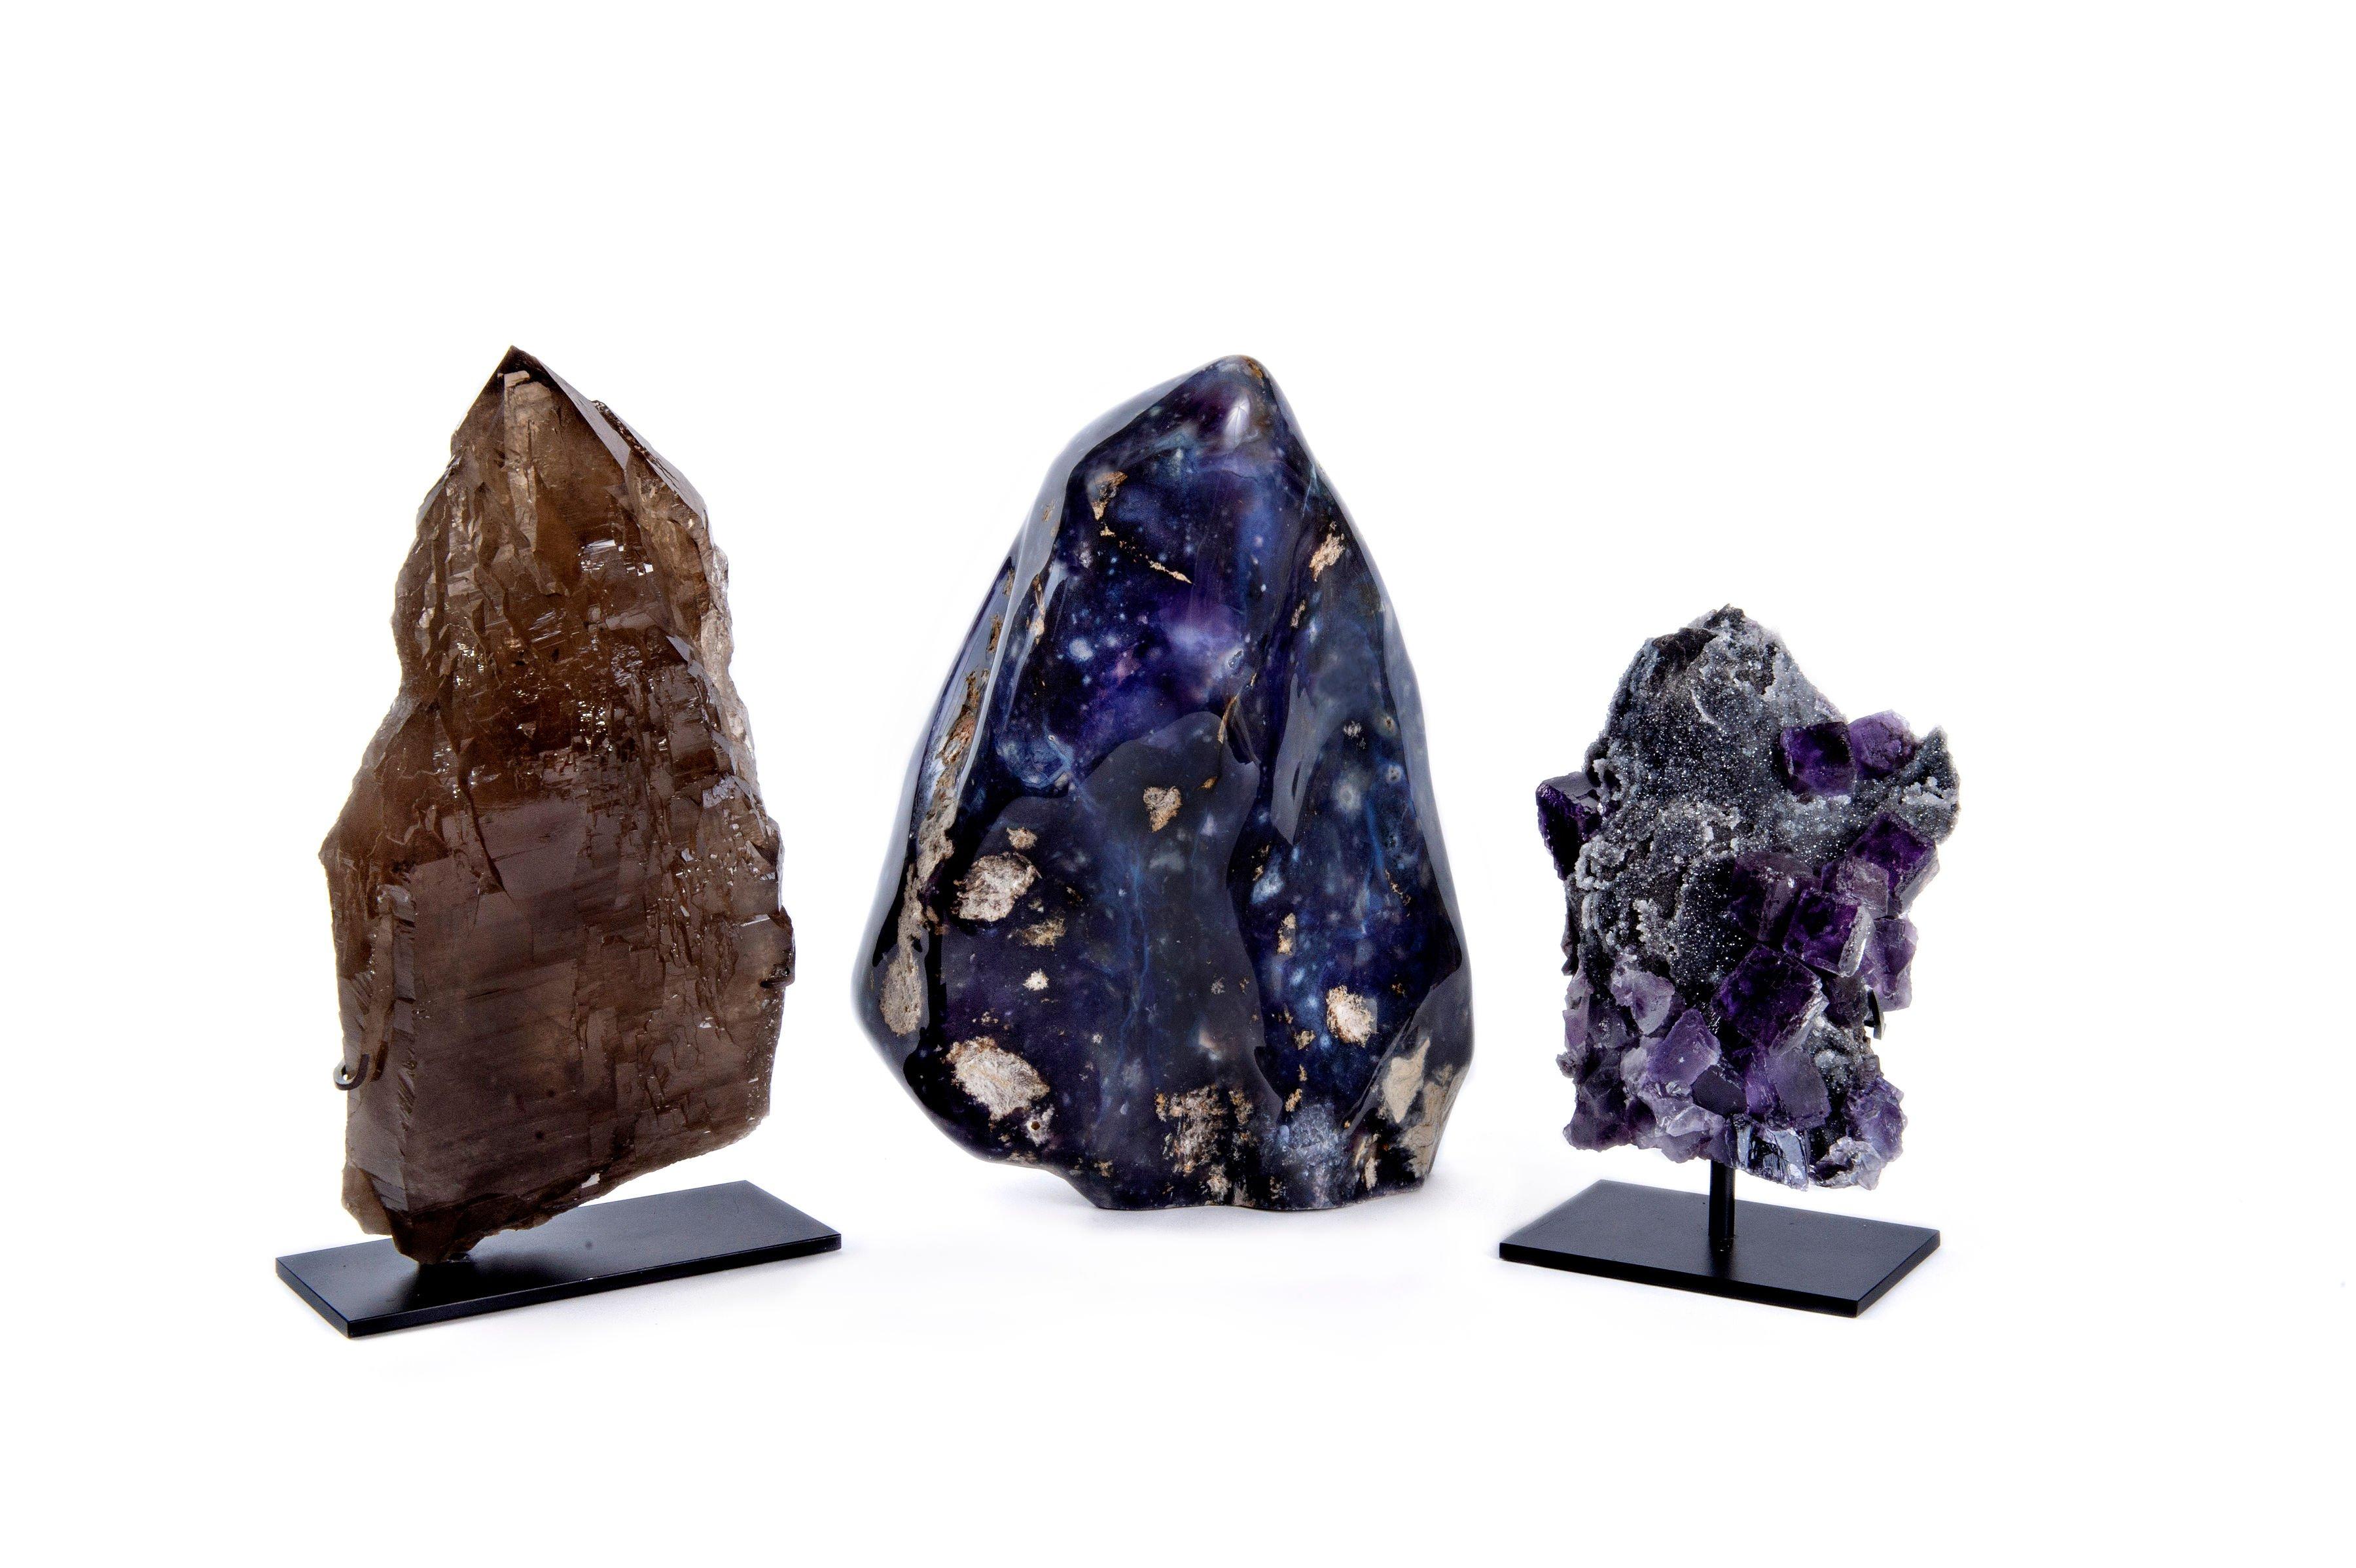 Architectural Minerals & Stones